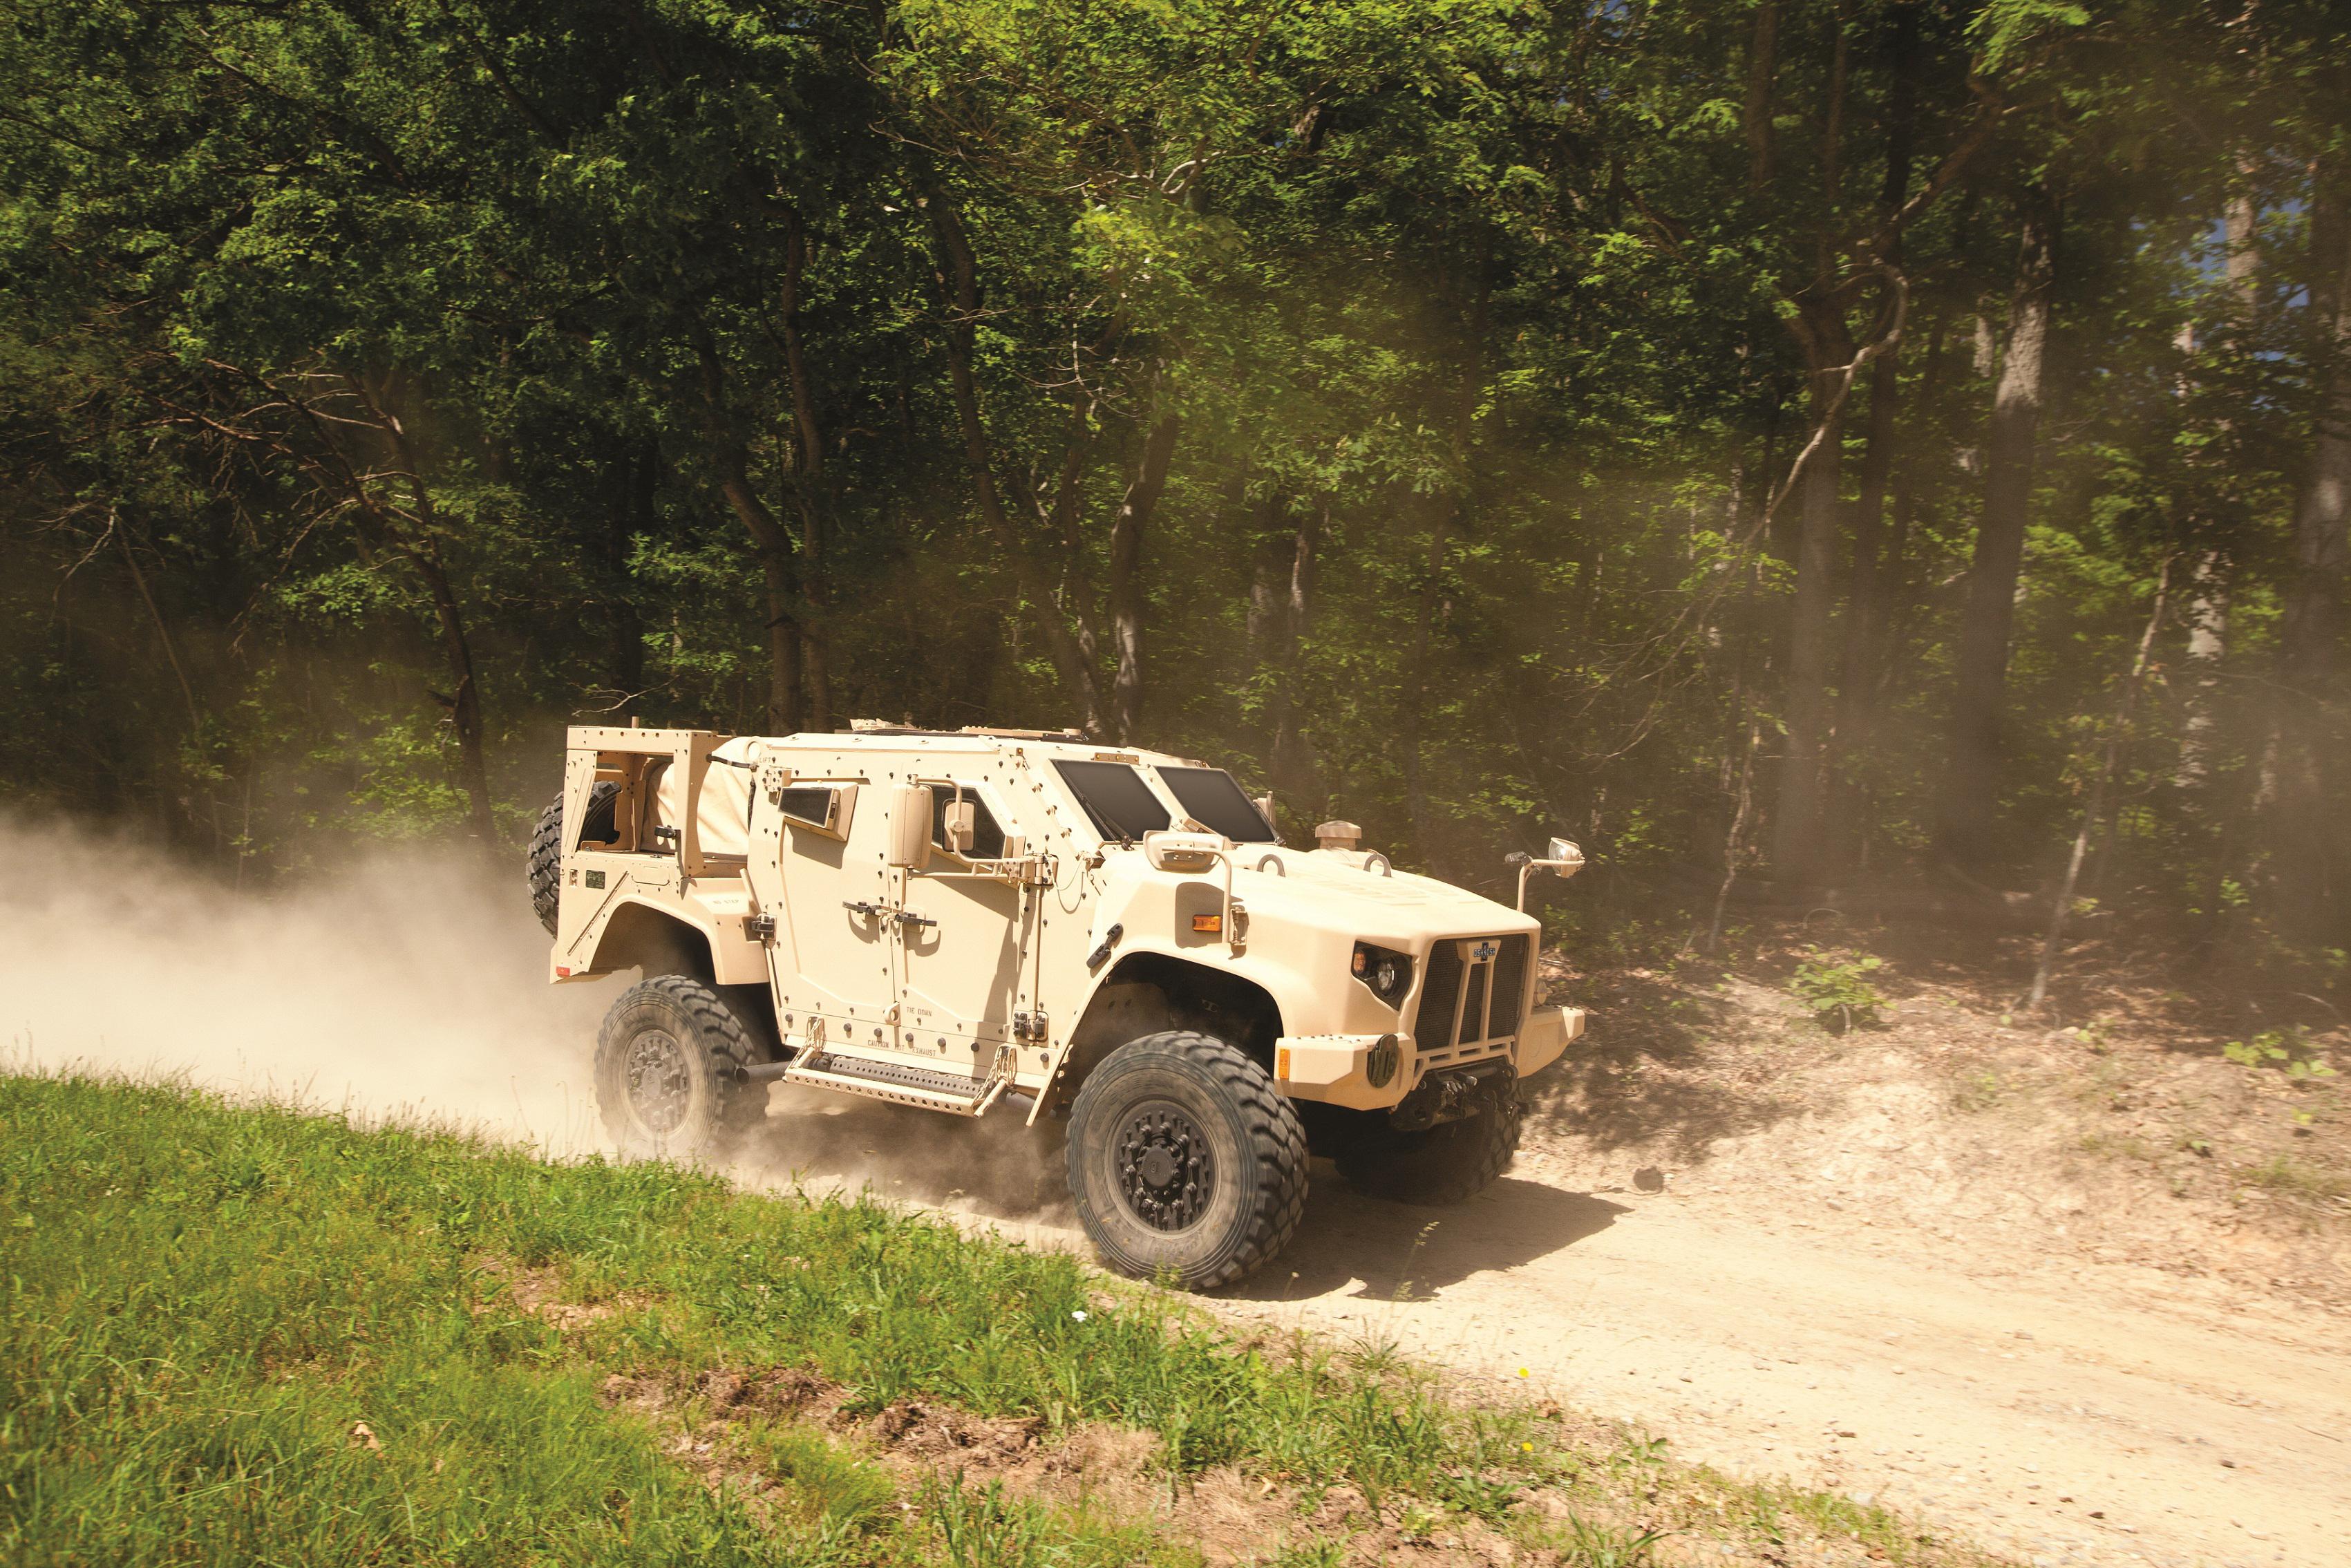 Obtaining a Applied ATV